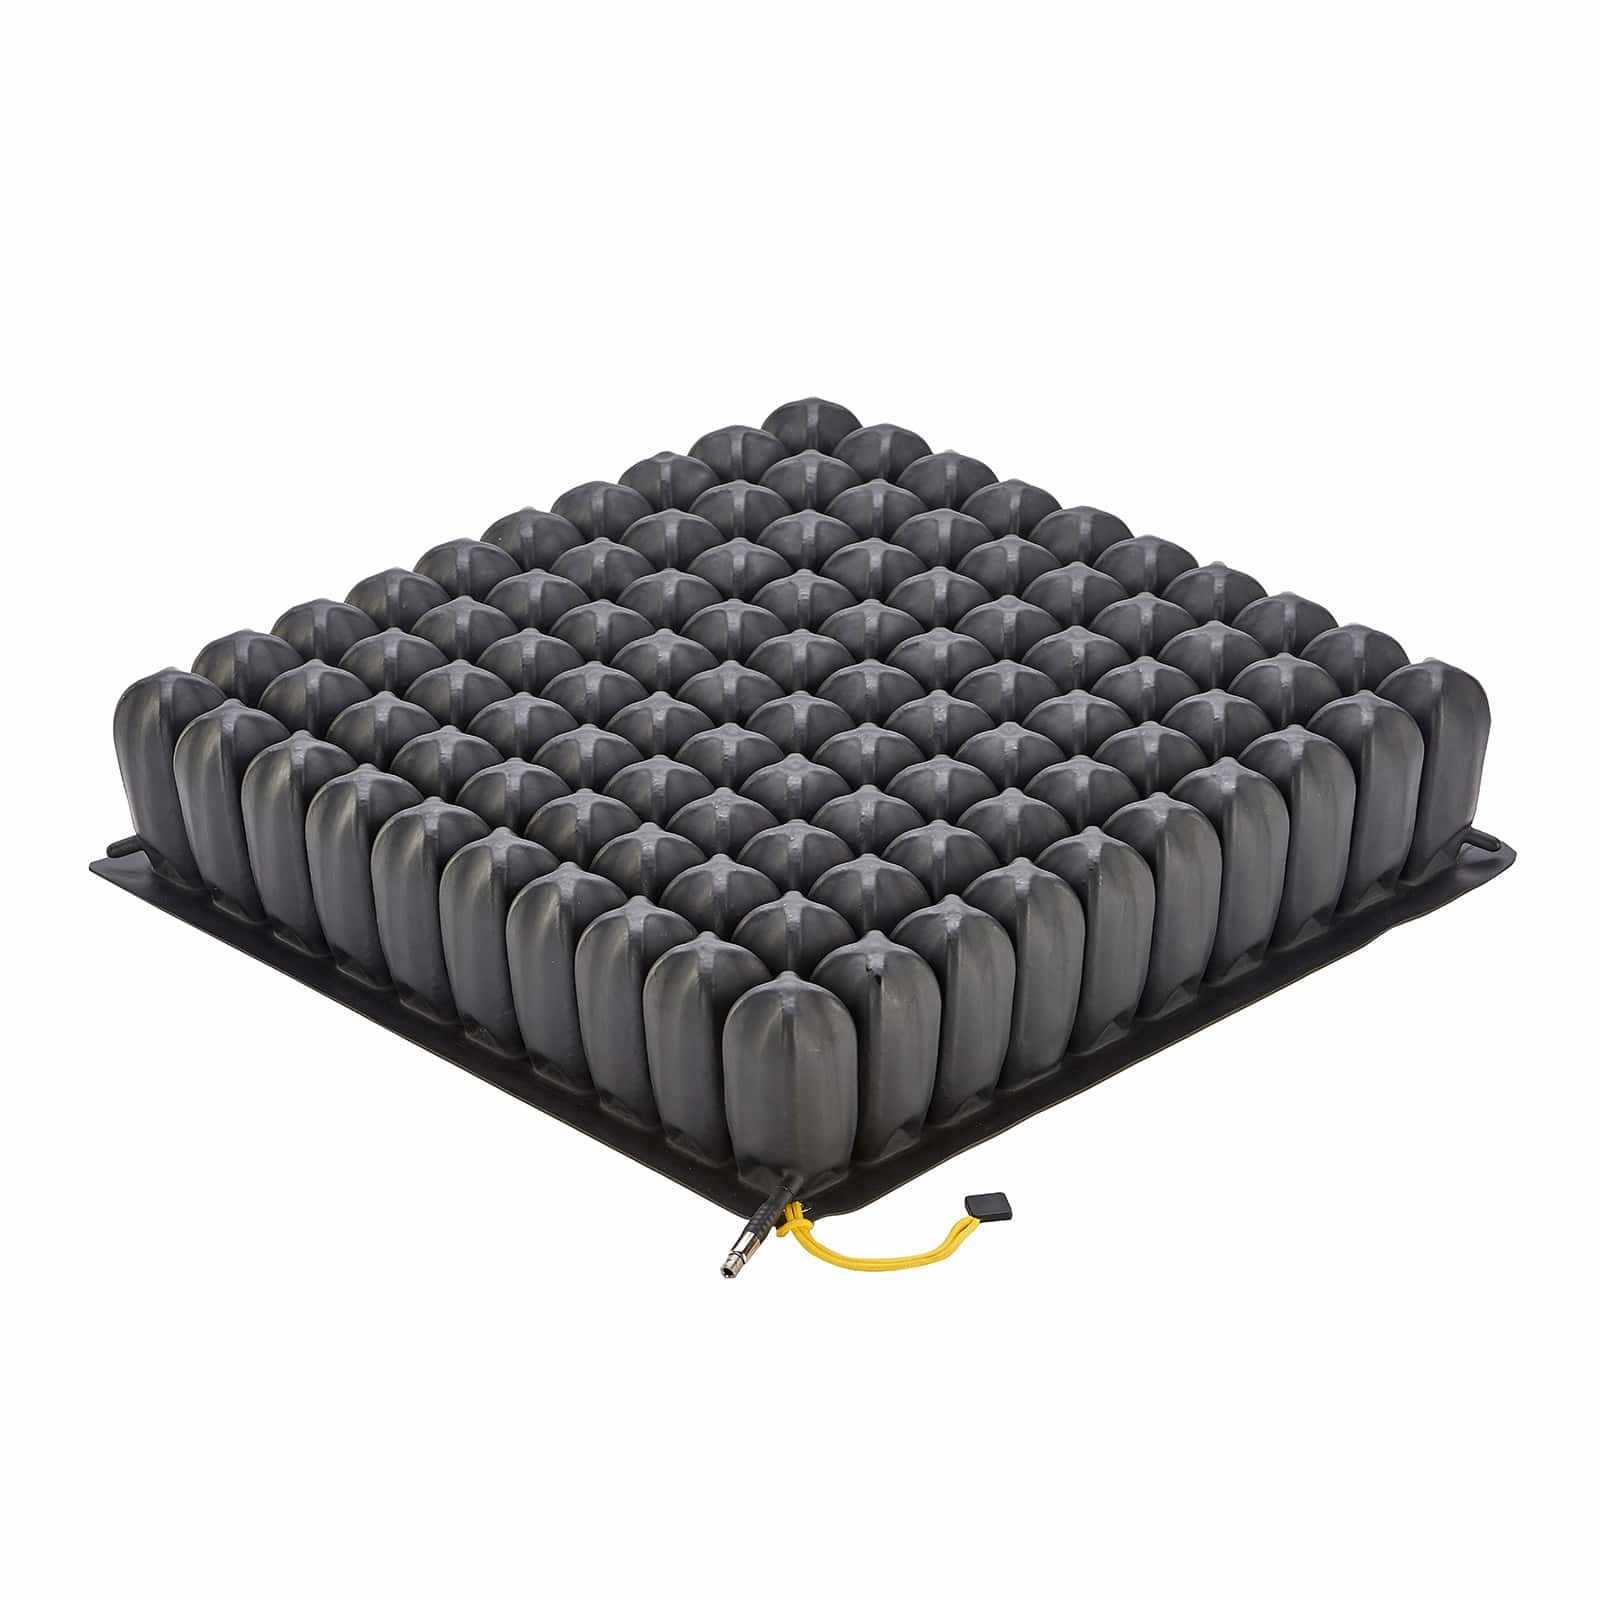 Roho High Profile Sensor Ready cushion with smart check system